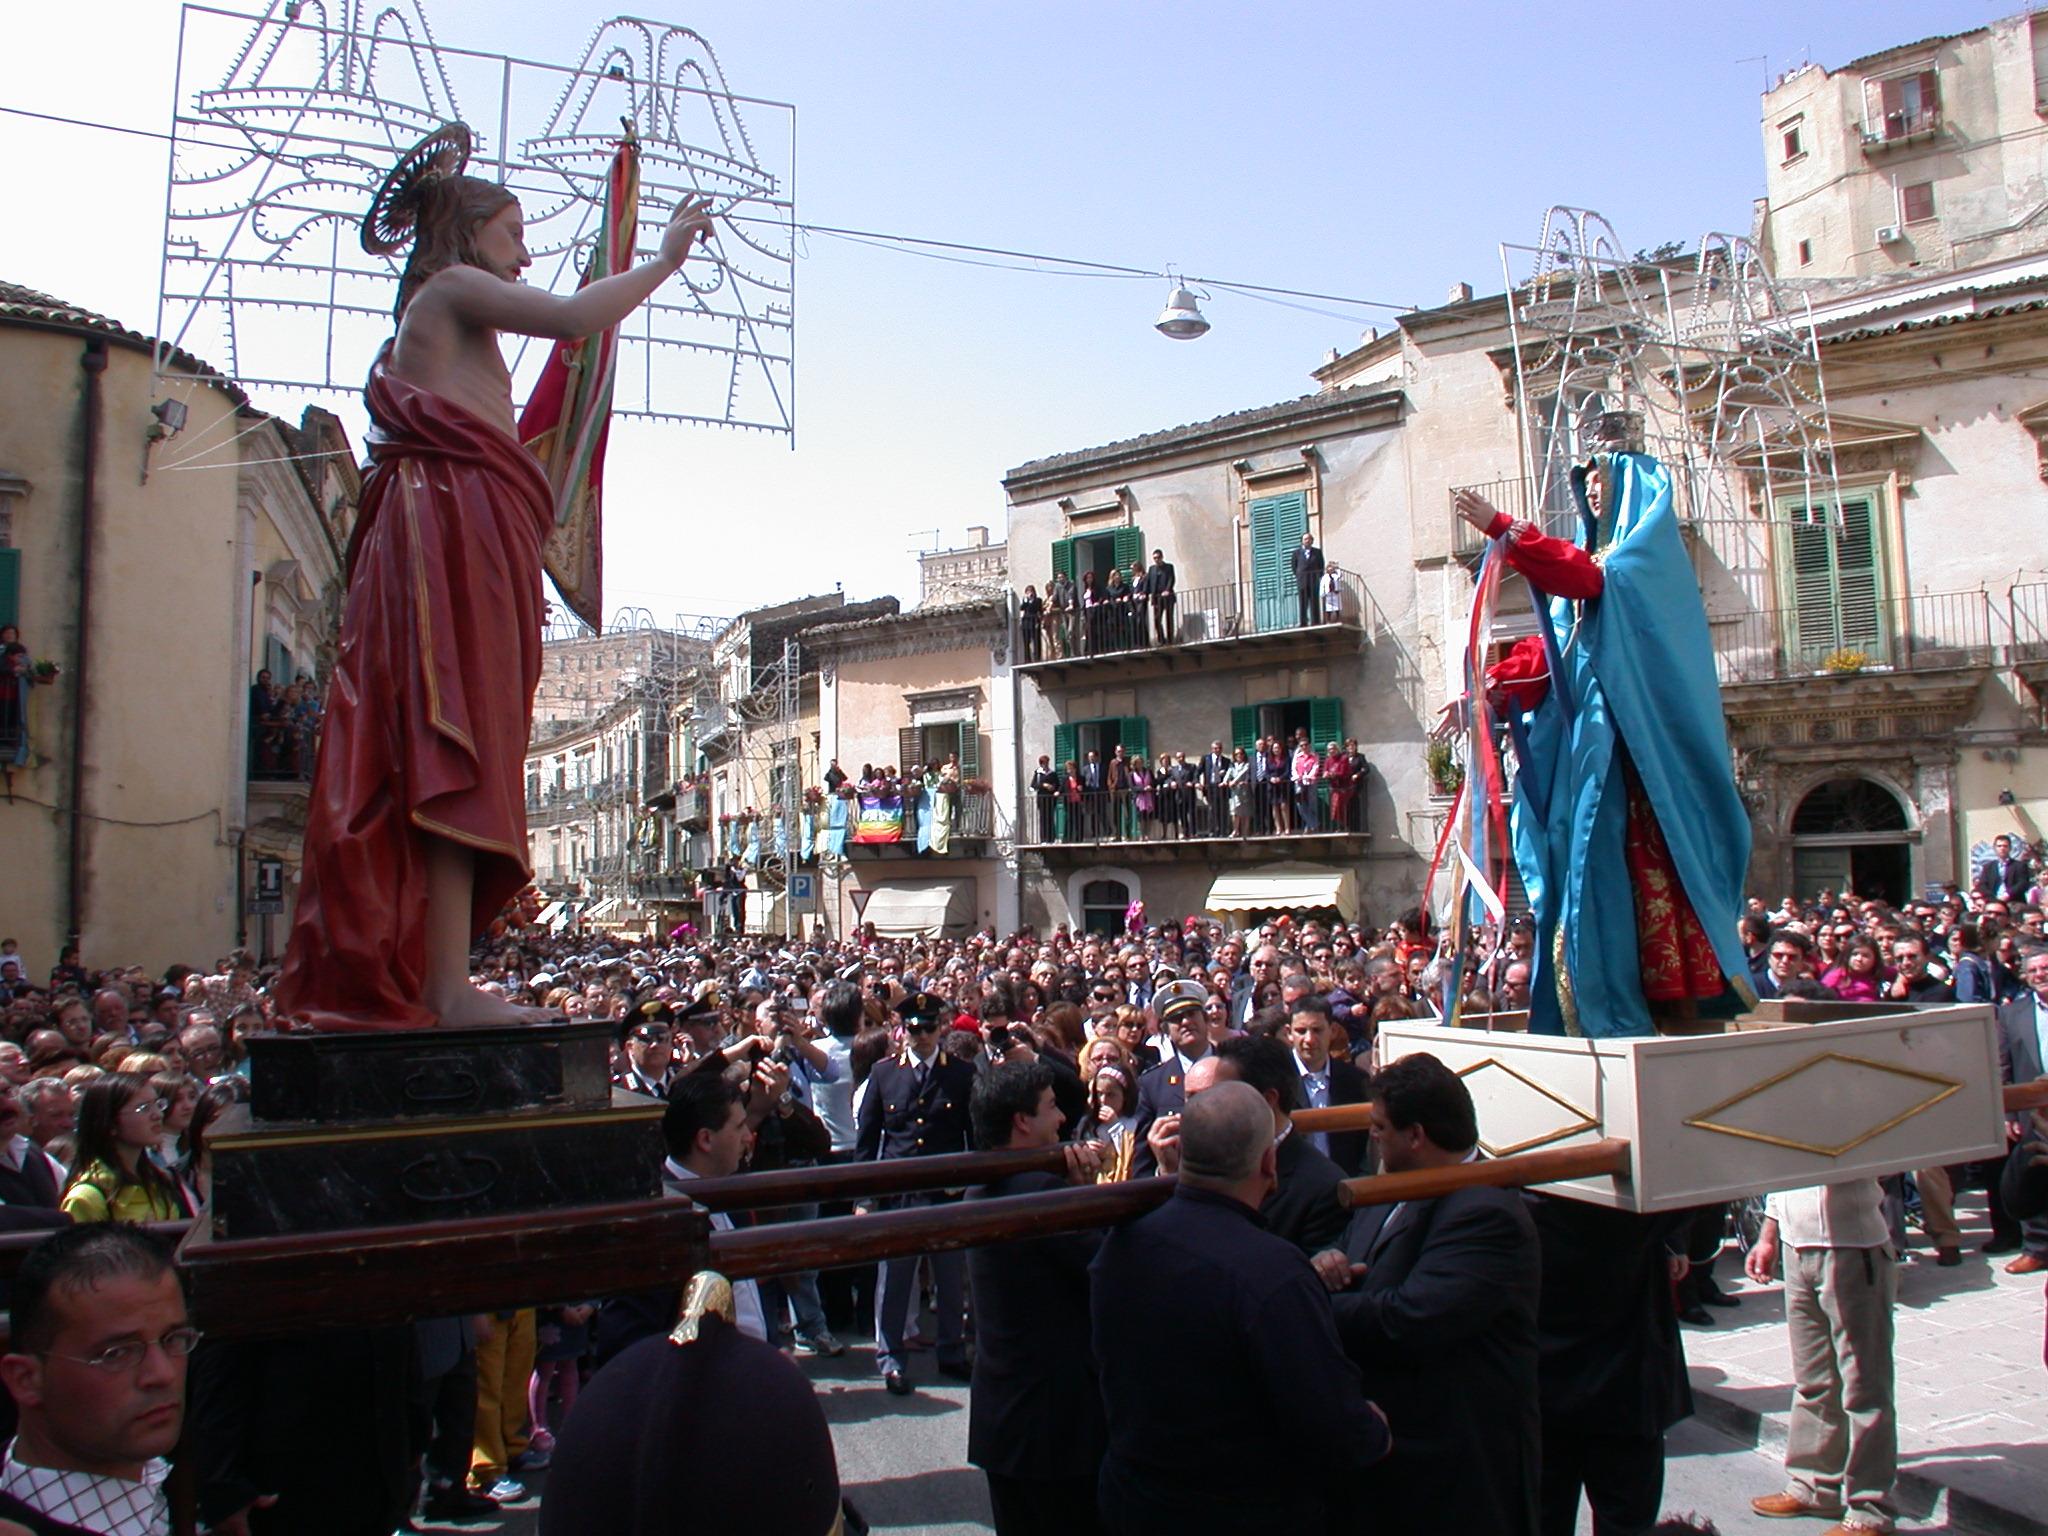 Luca Errera, Daniela Trastulli, Sicilia, Modica, Maronna vasa vasa, Vasa-vasa